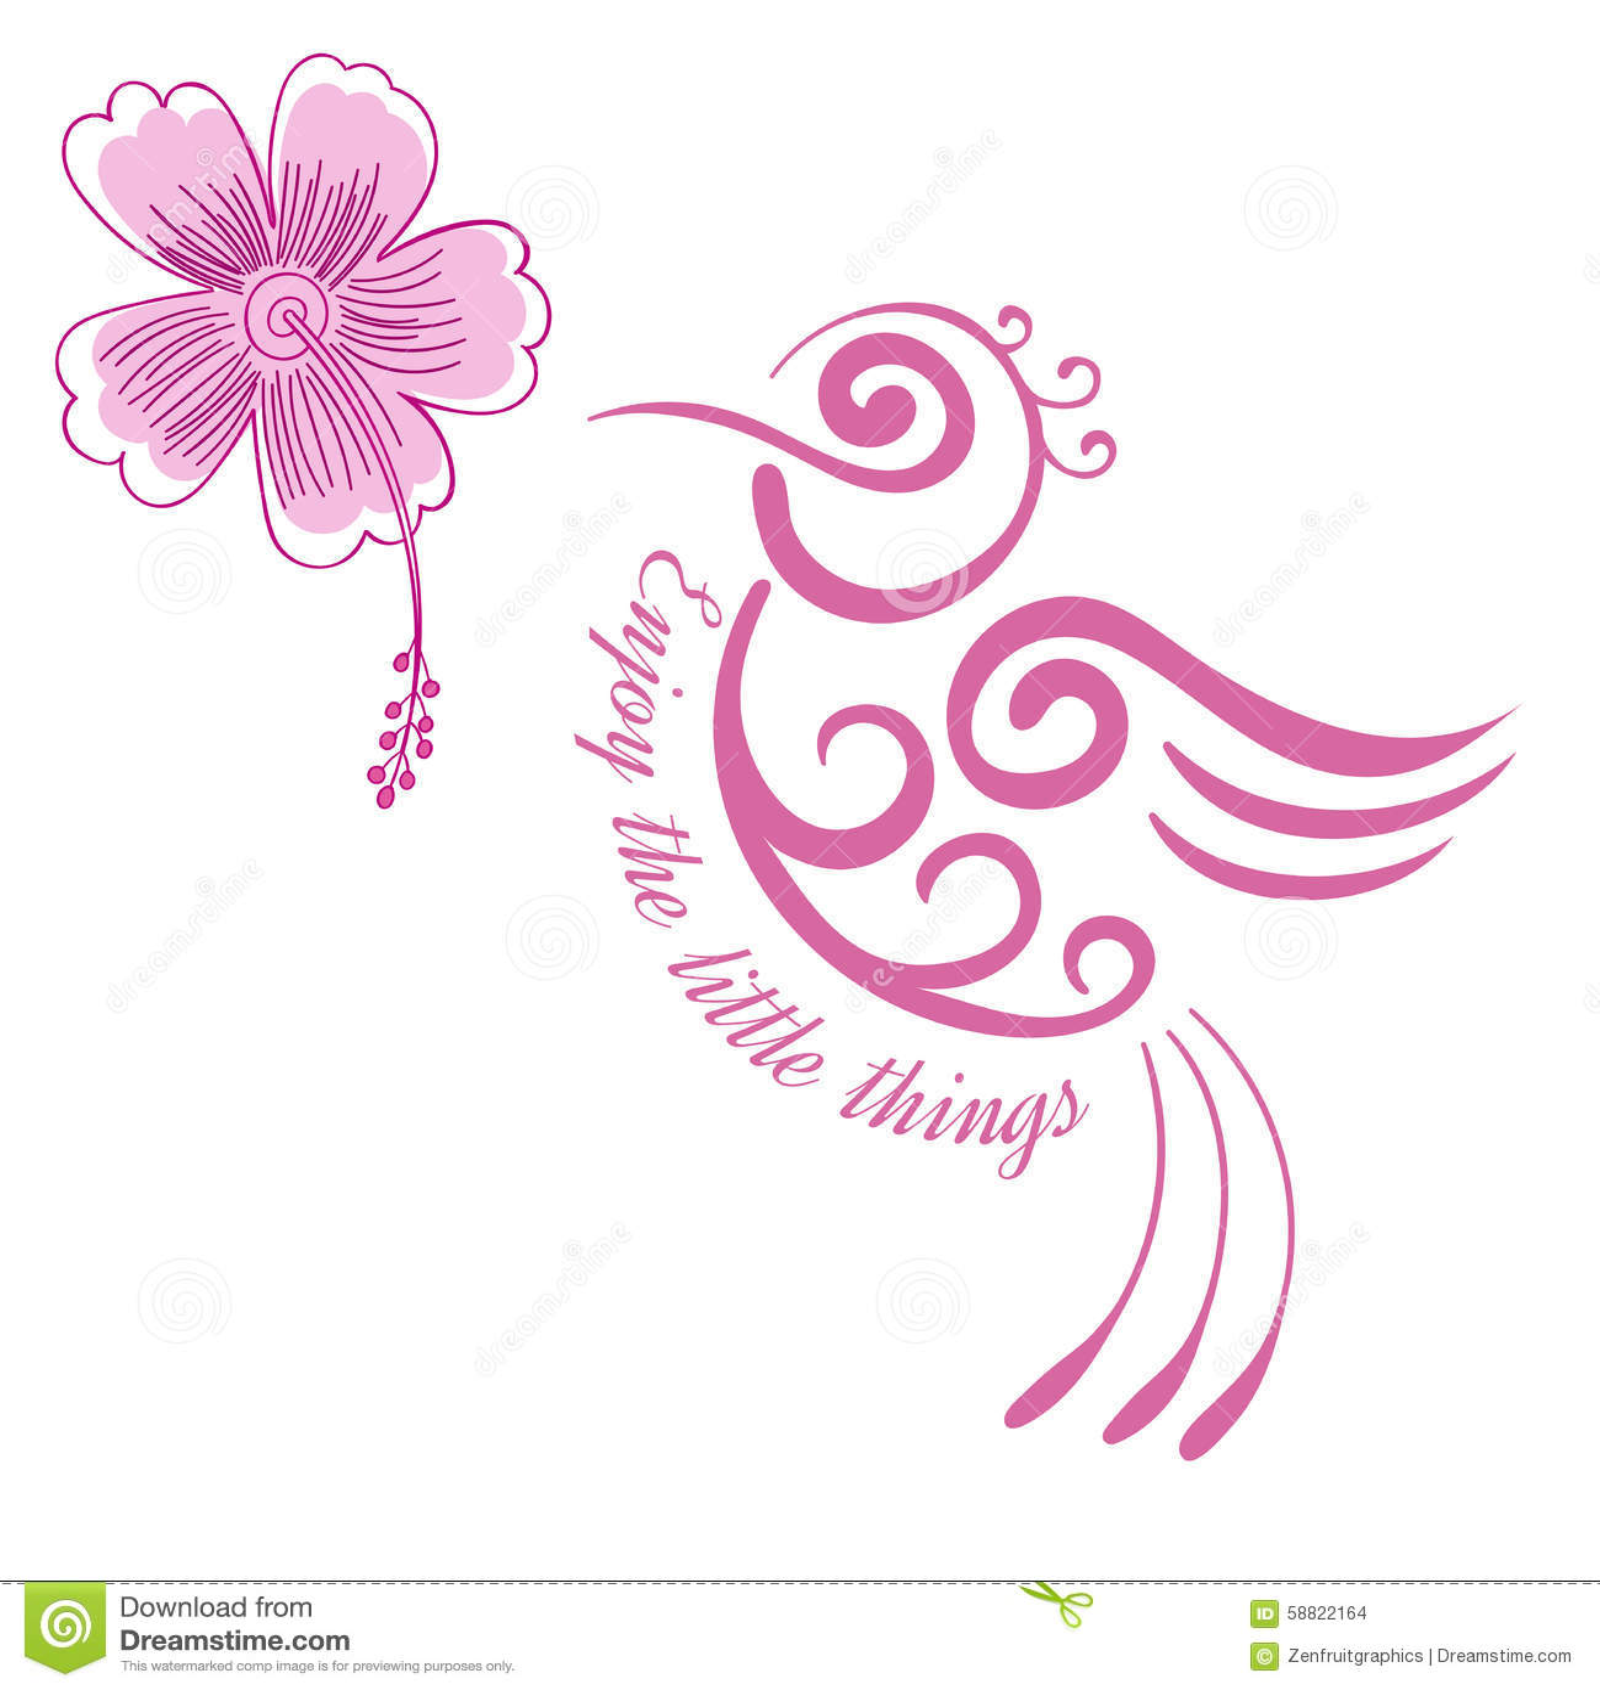 Hummingbird Flower Inspirational Quote Motivational Poster Stylized